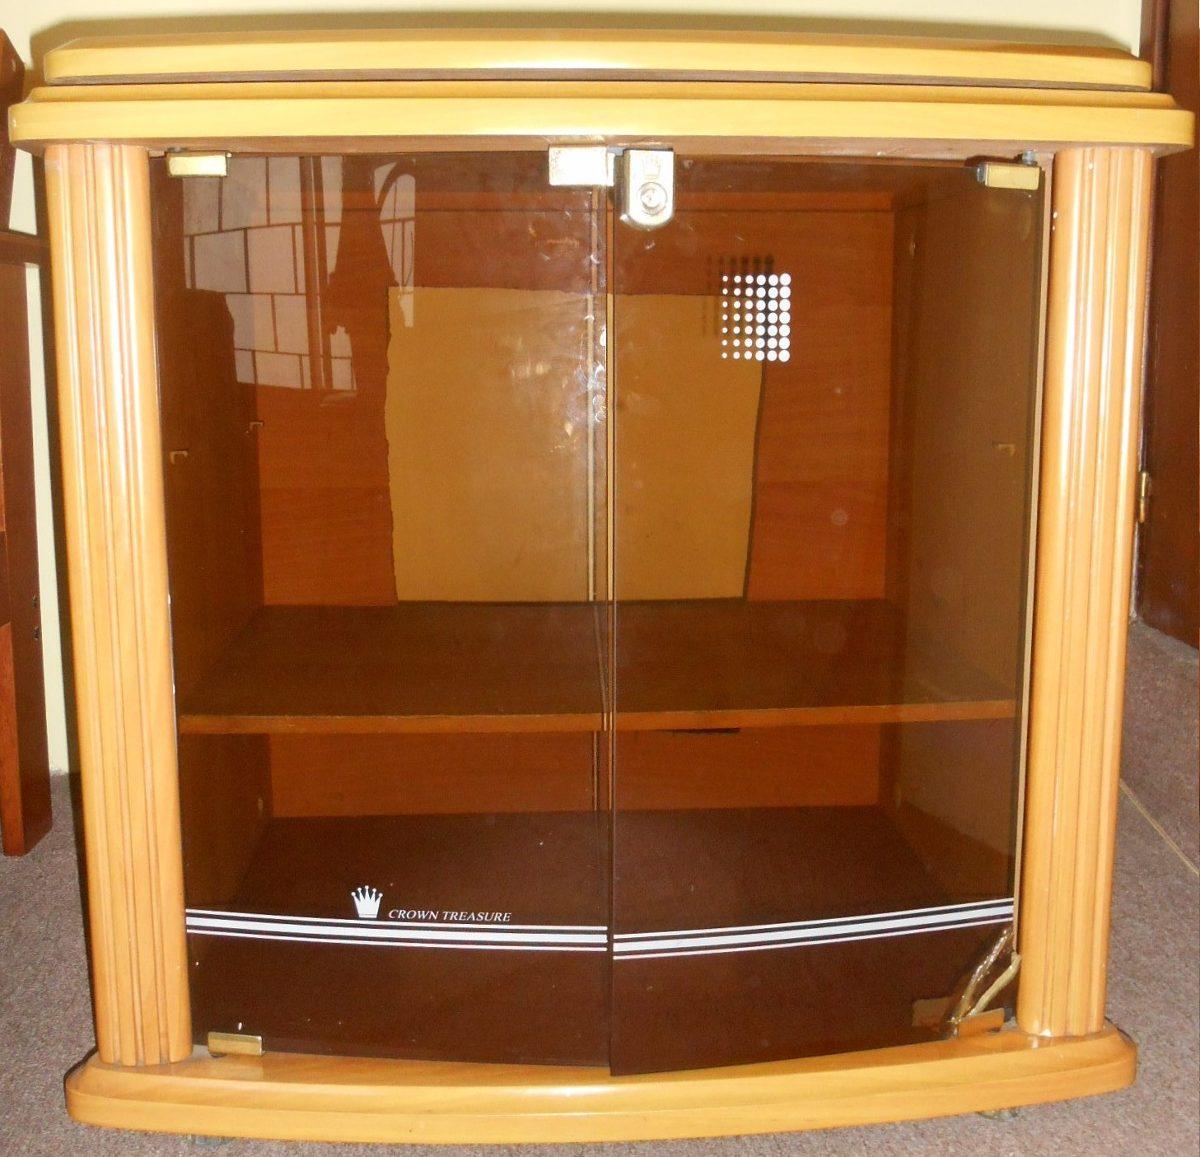 Mueble rack para televisi n equipo de audio canalera o for Mueble para dvd